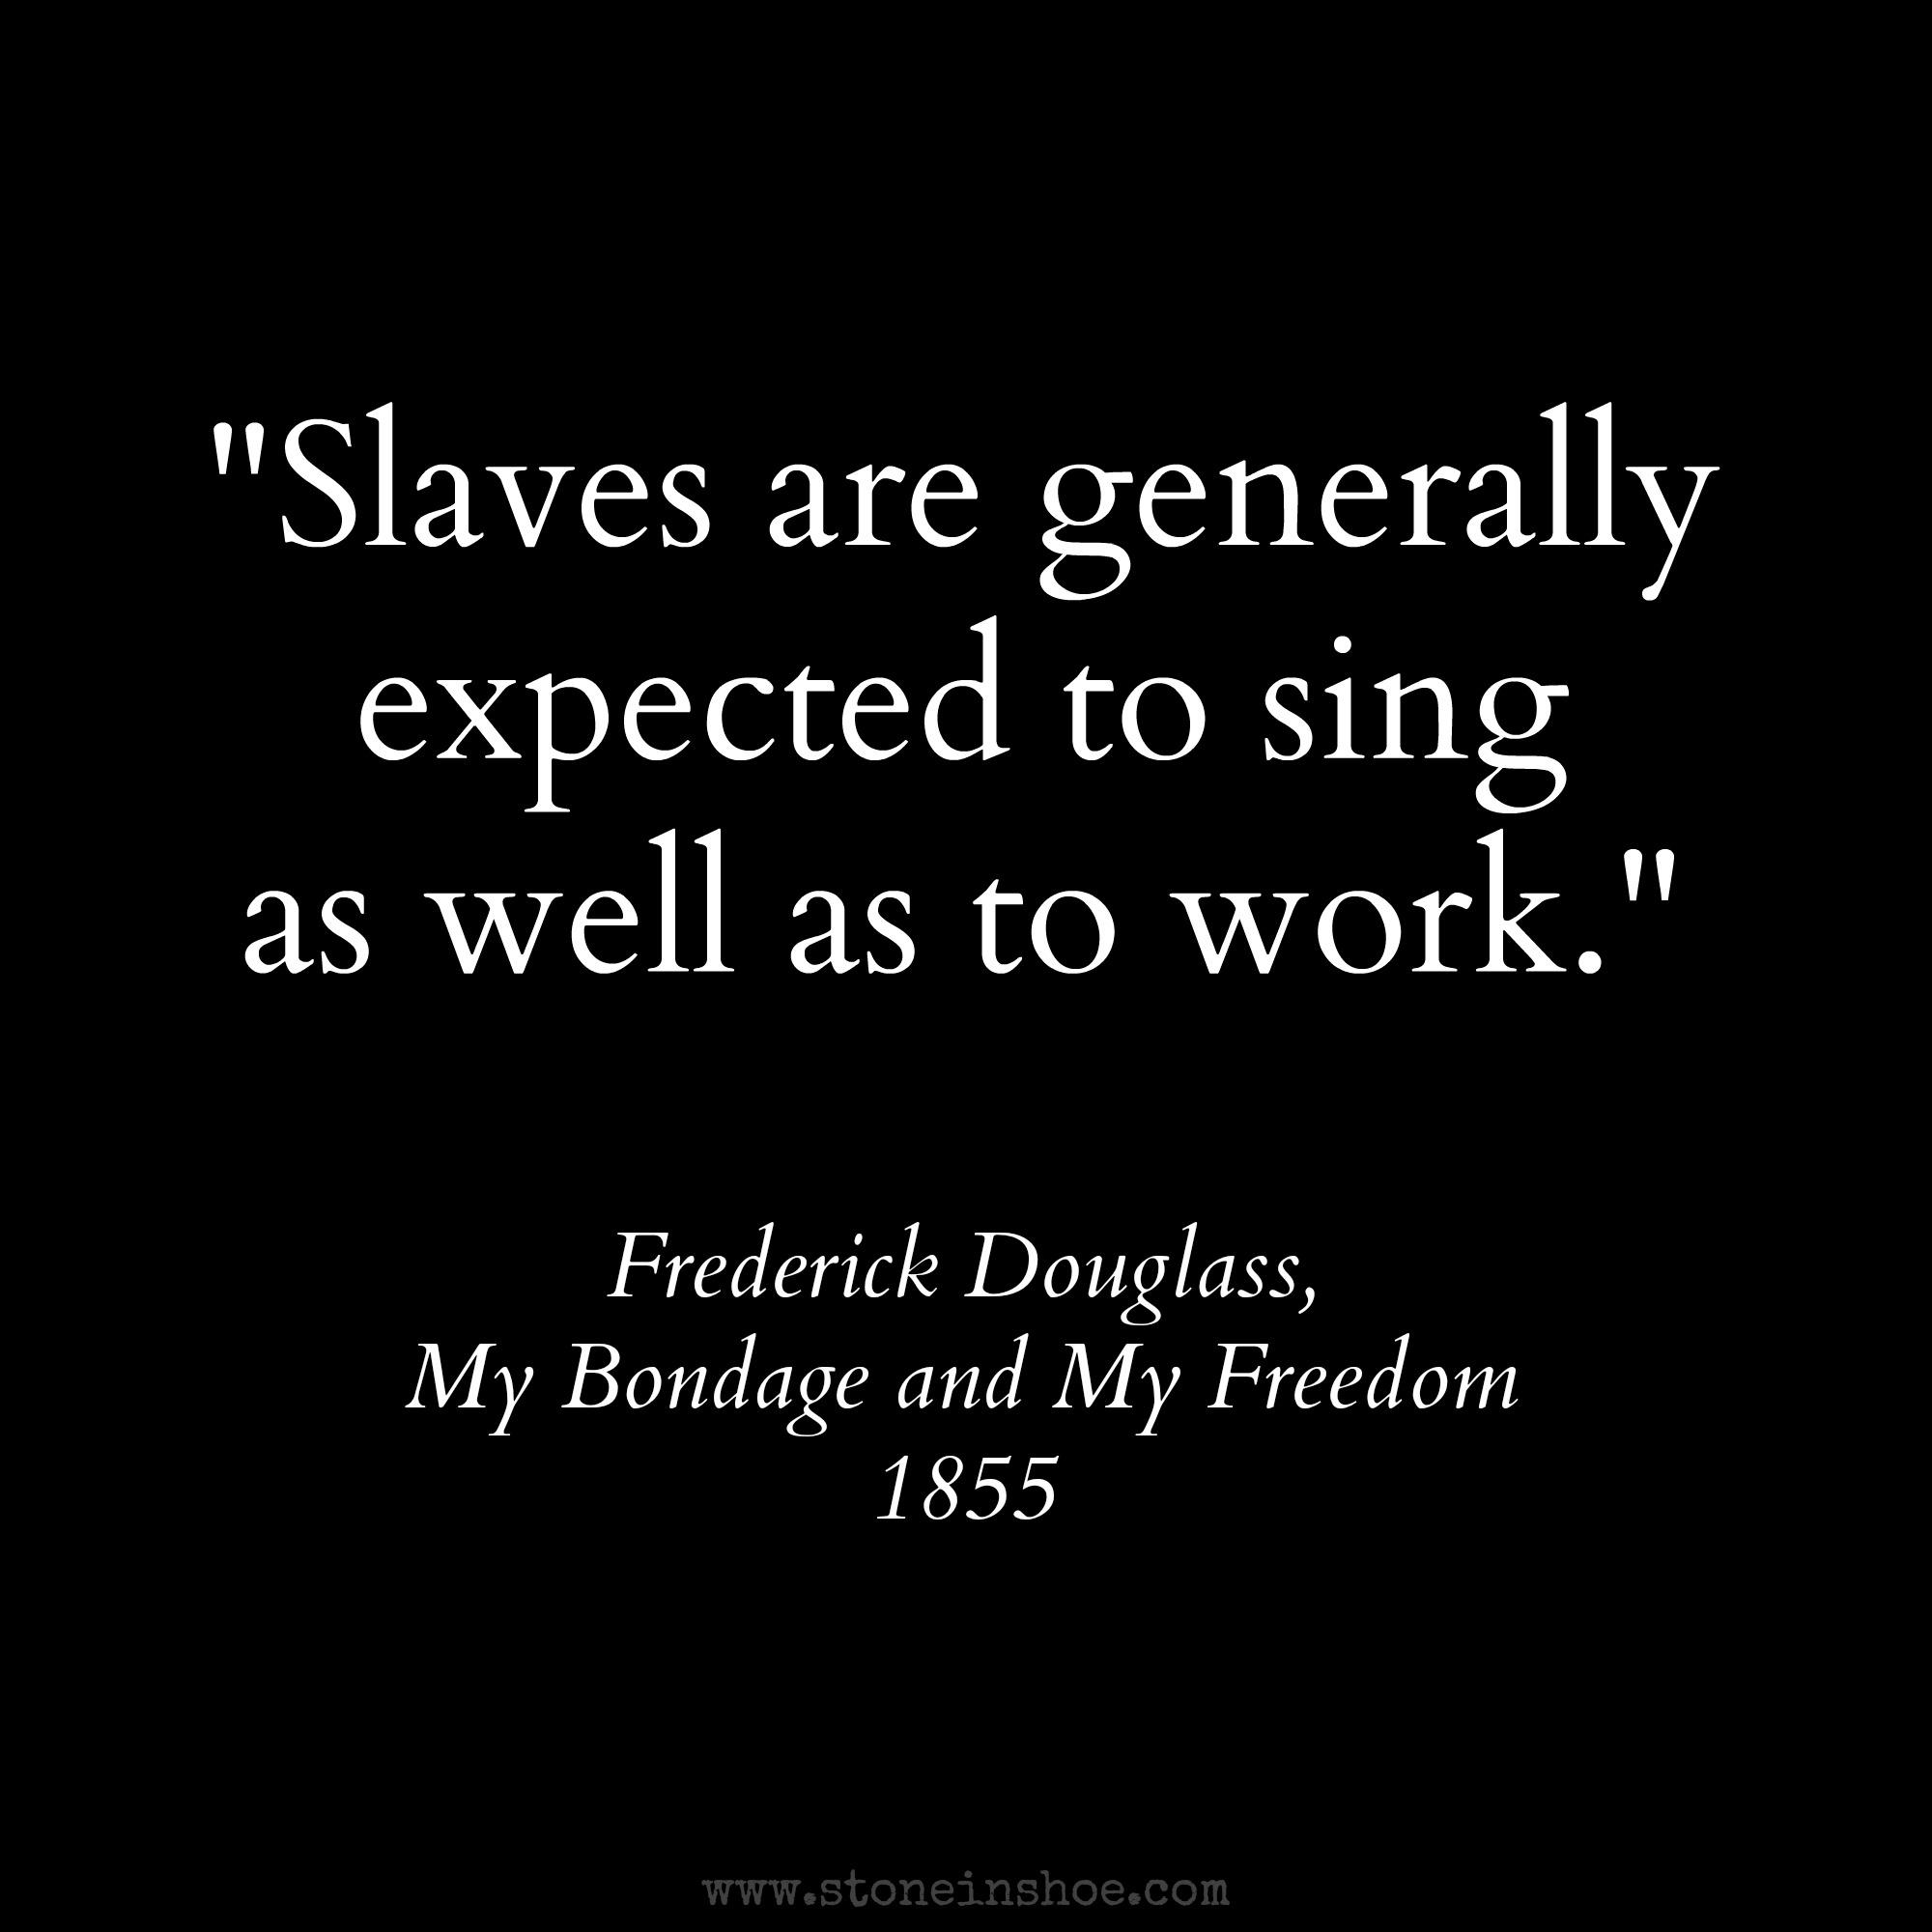 Frederick Douglass Quotes On Slavery Quotesgram